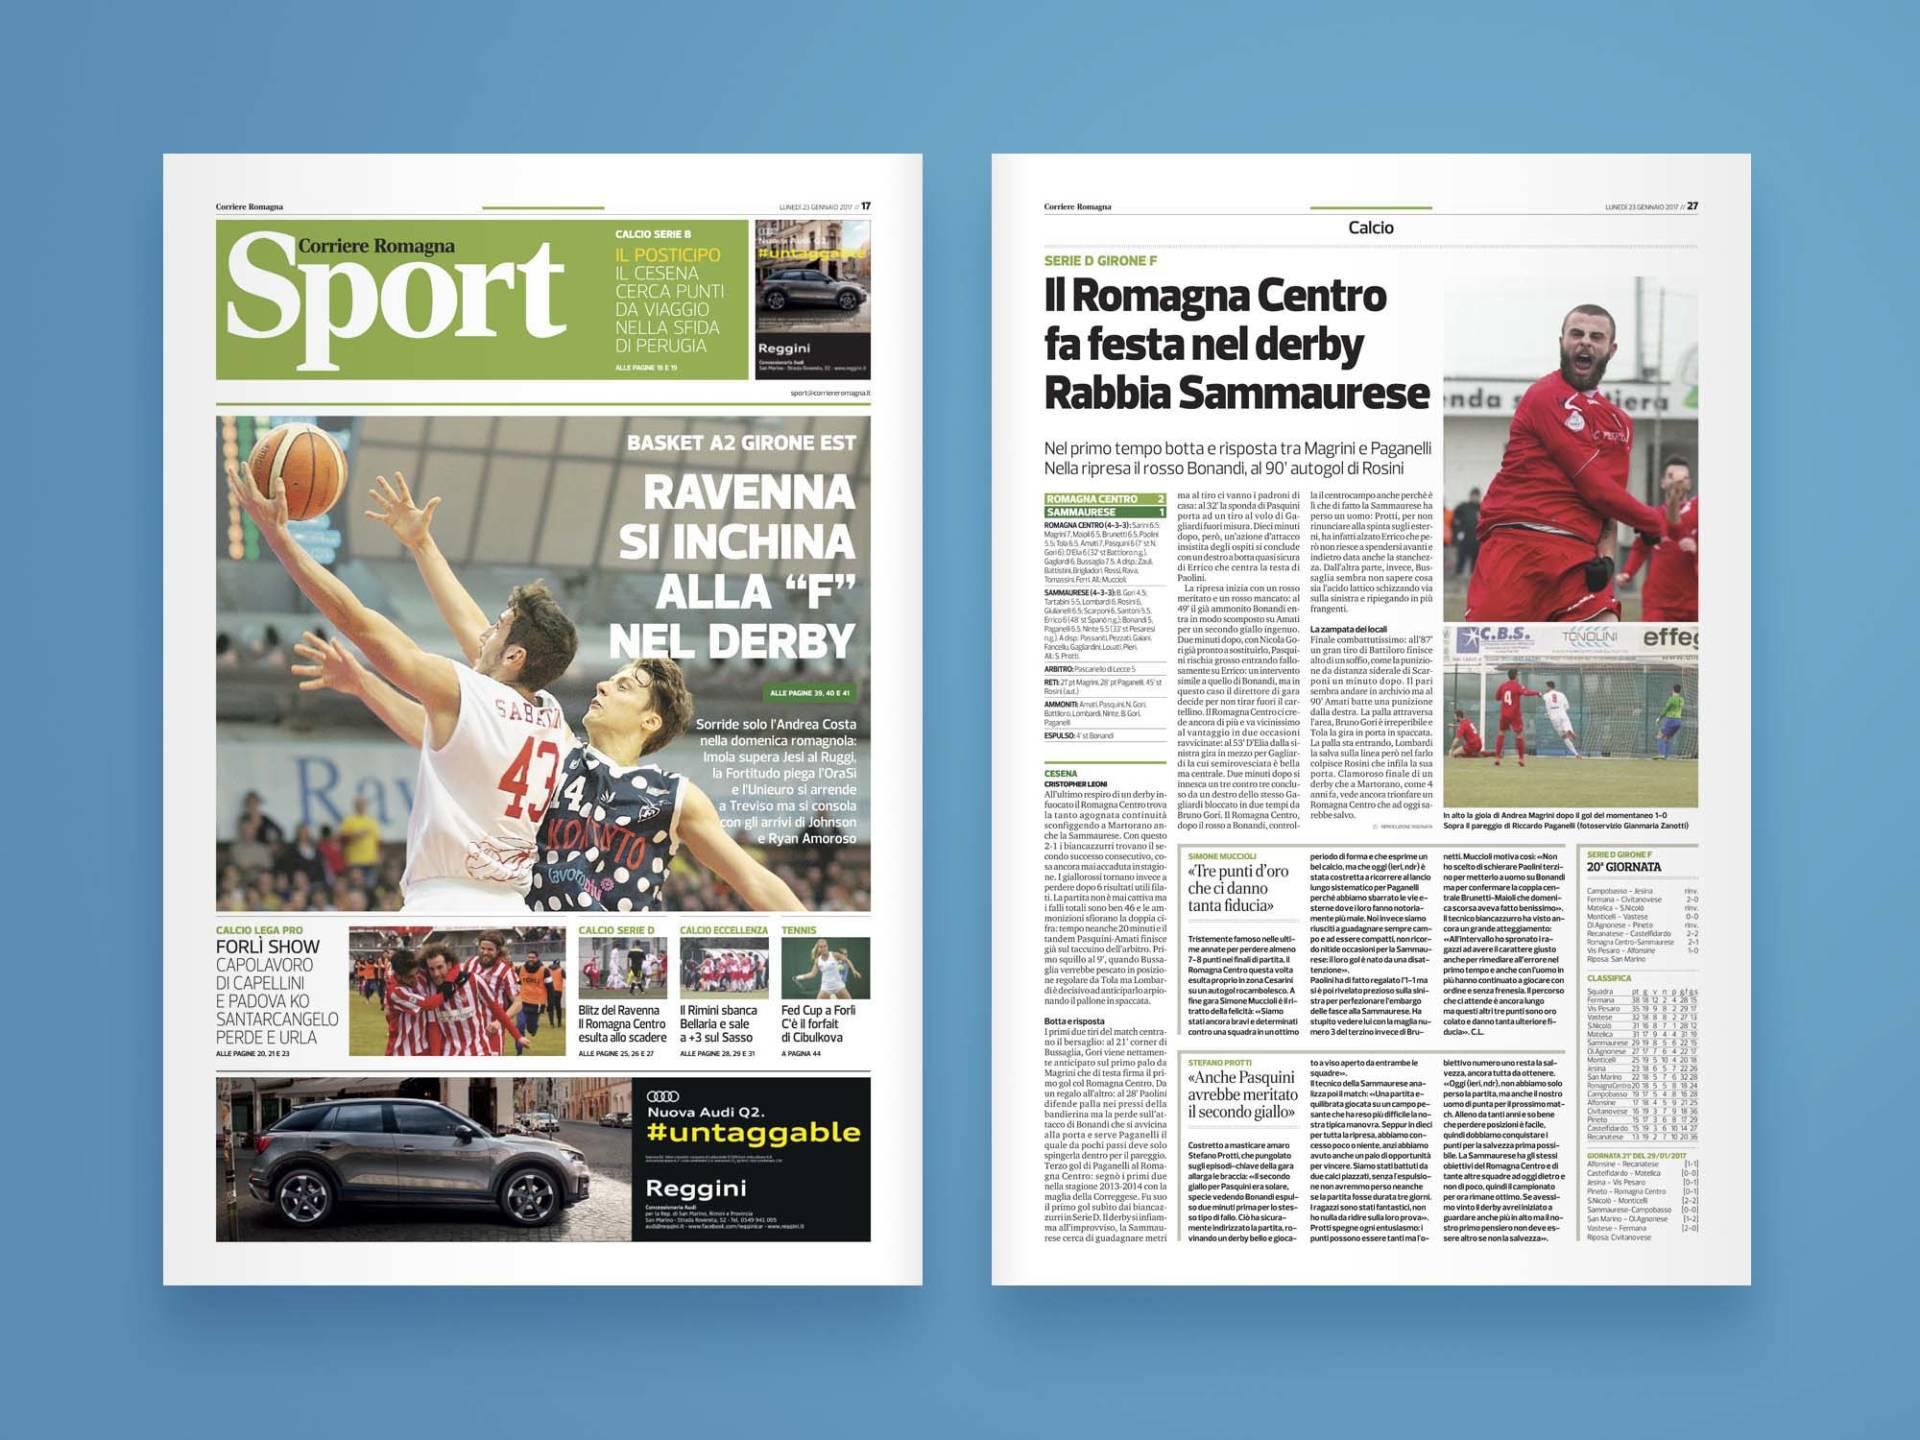 Corriere_Romagna_07_Wenceslau_News_Design